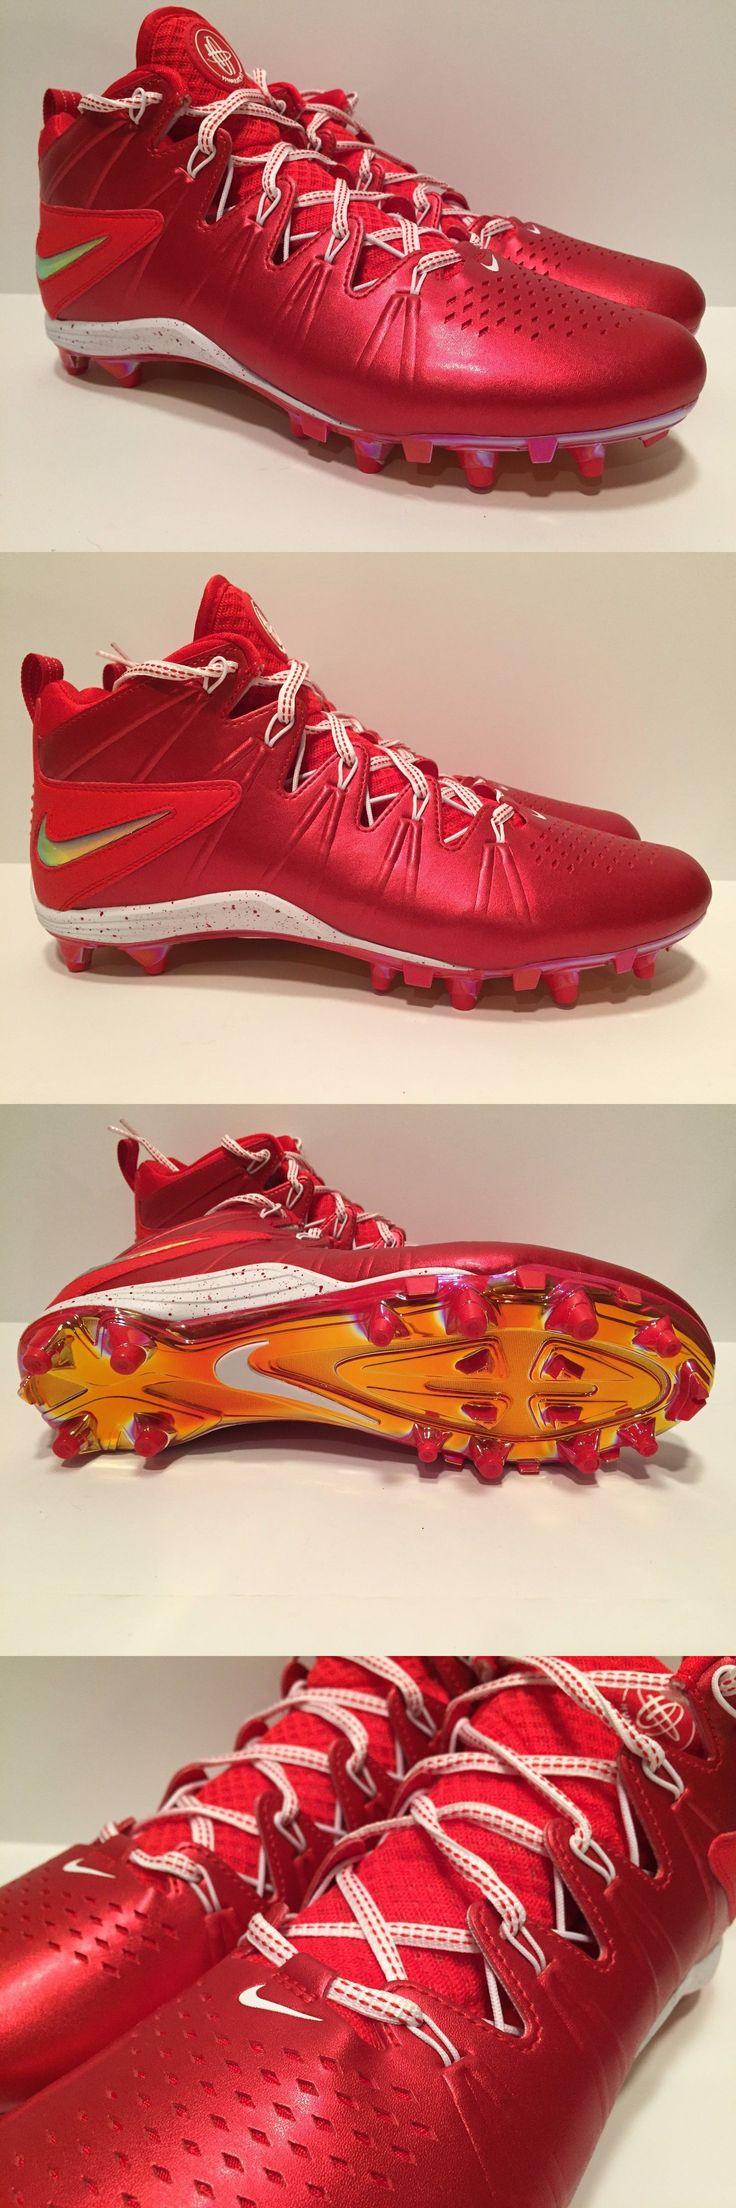 Footwear 159154: Nike Huarache 4 Lax Lacrosse Cleats, Size 10, Red, 624978-601 -> BUY IT NOW ONLY: $44.99 on eBay!